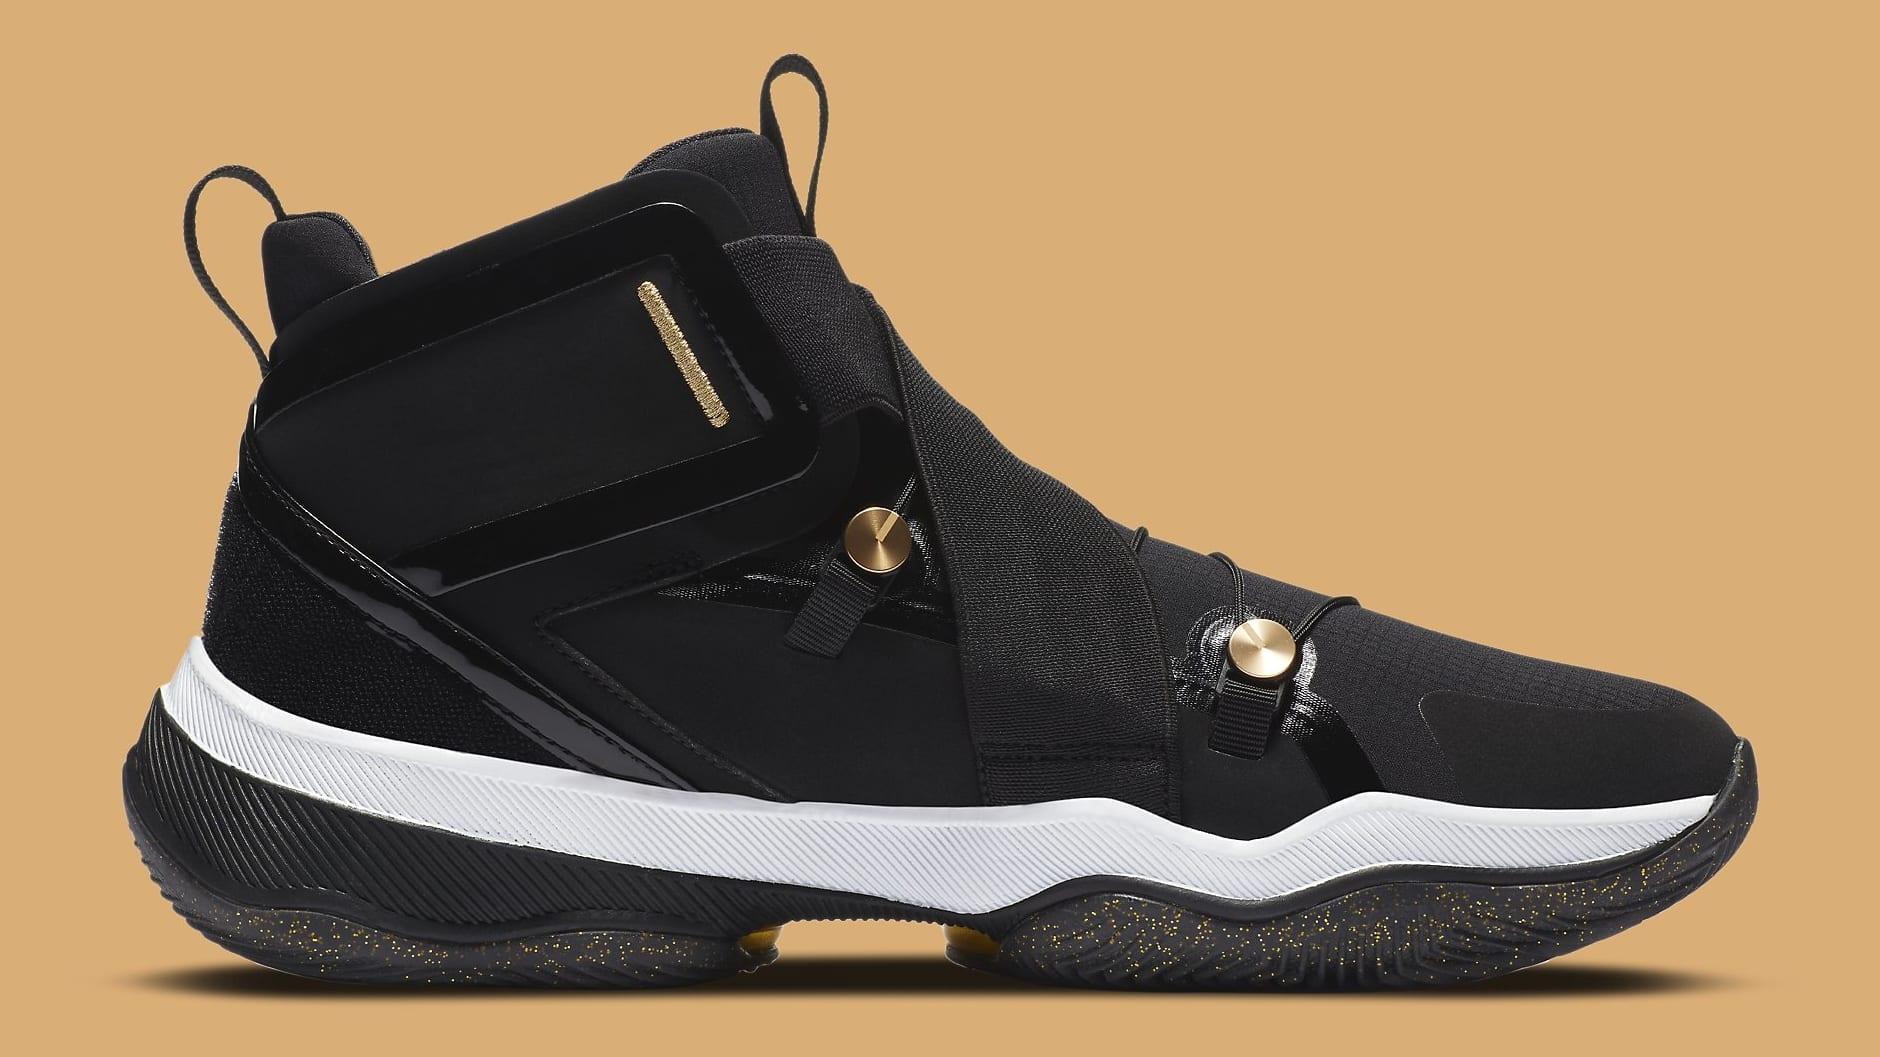 Jordan AJNT 23 Black Gold Release Date CI5441-008 Medial